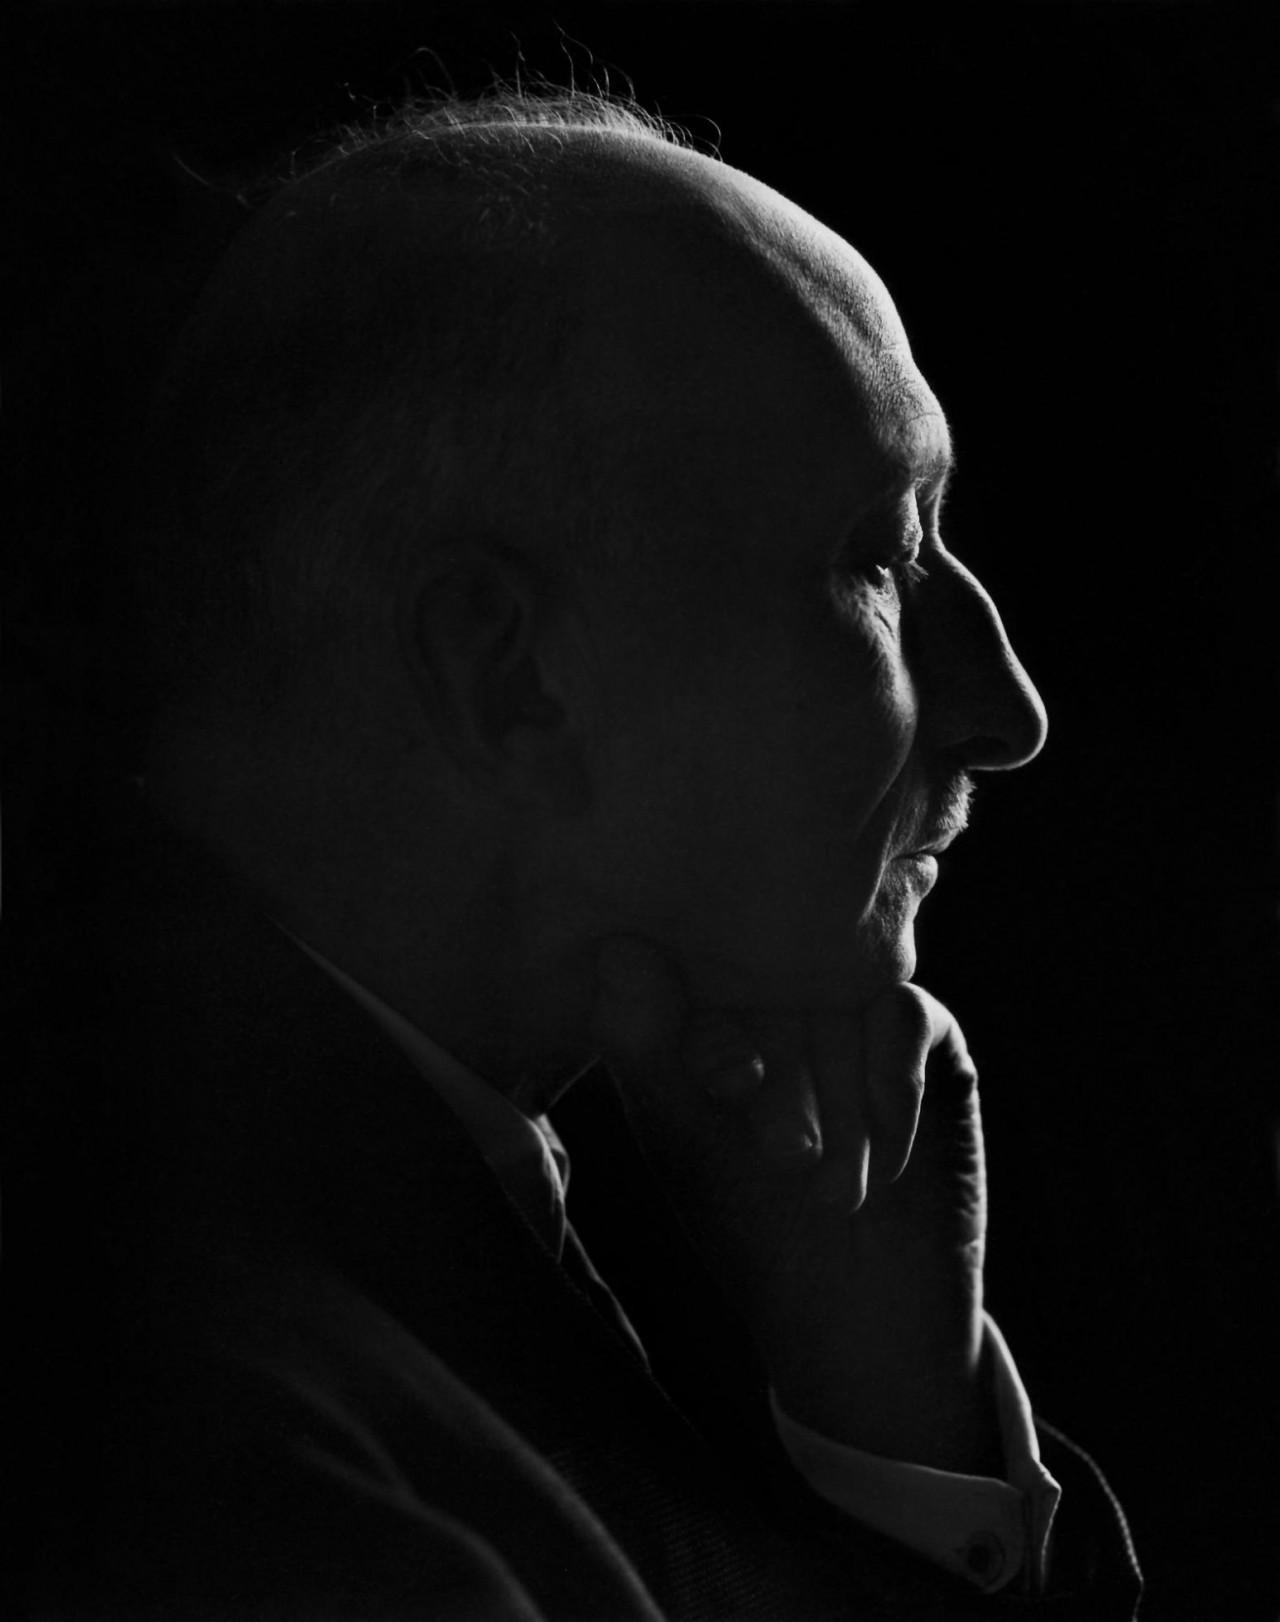 Франсуа Мориак, 1949. Автор Юсуф Карш